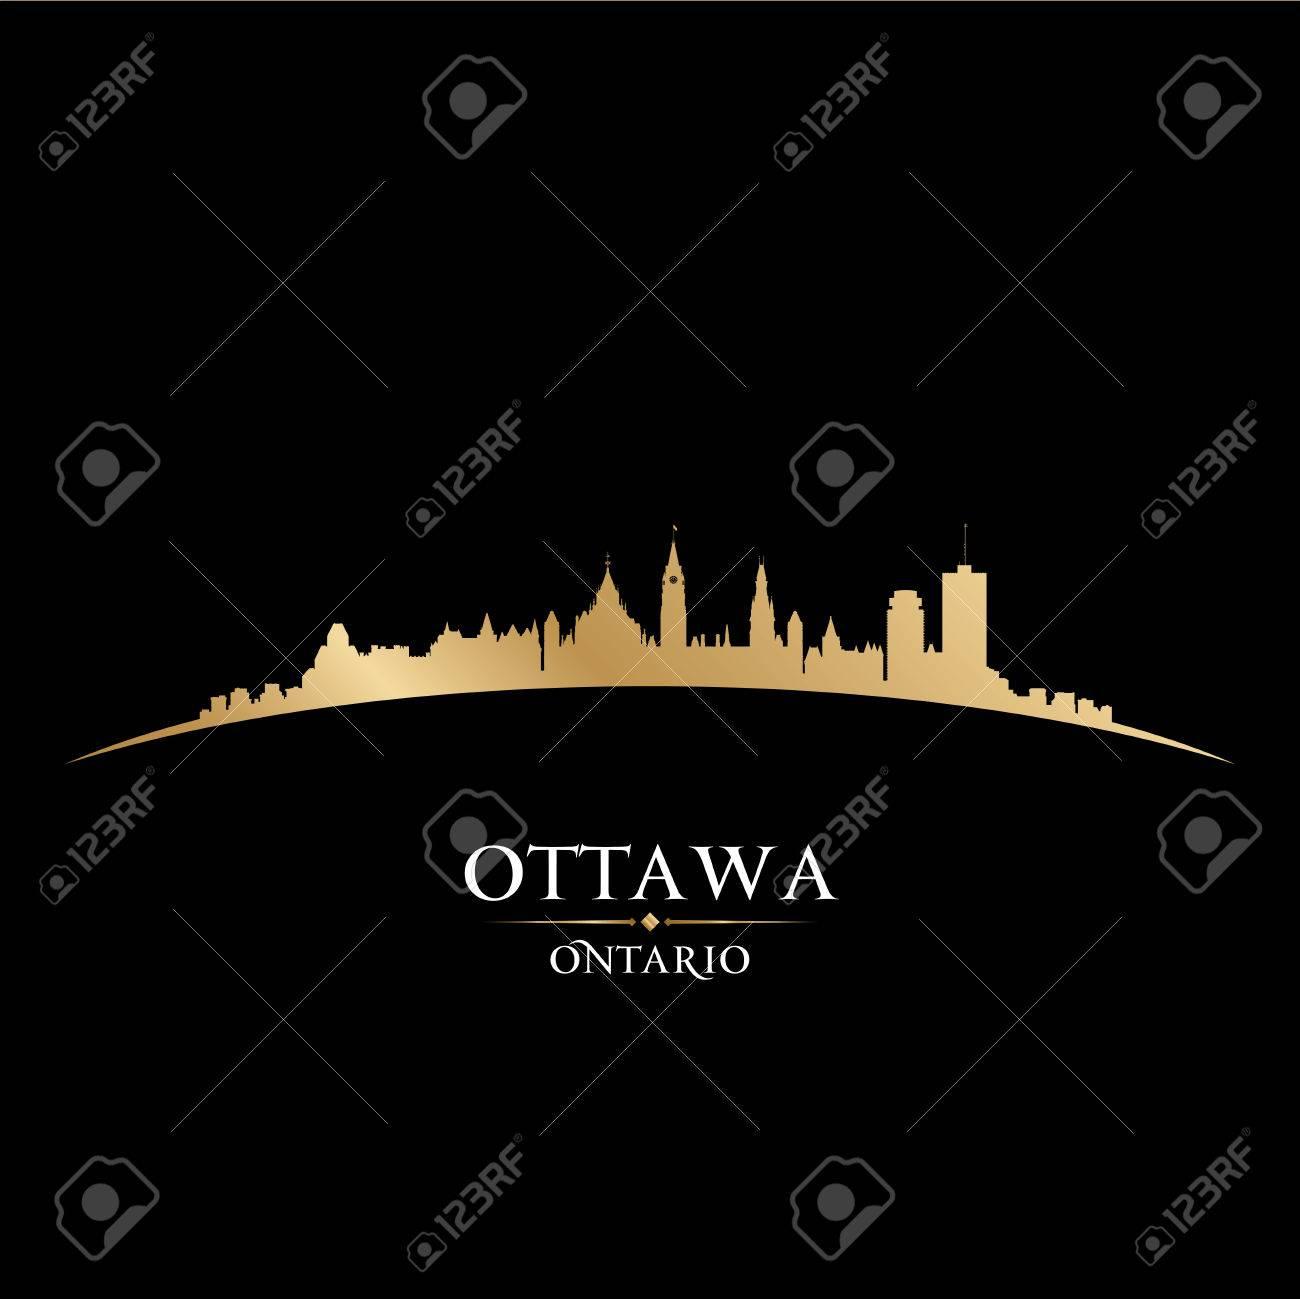 Ottawa Ontario Canada city skyline silhouette. Vector illustration Stock Vector - 22867318